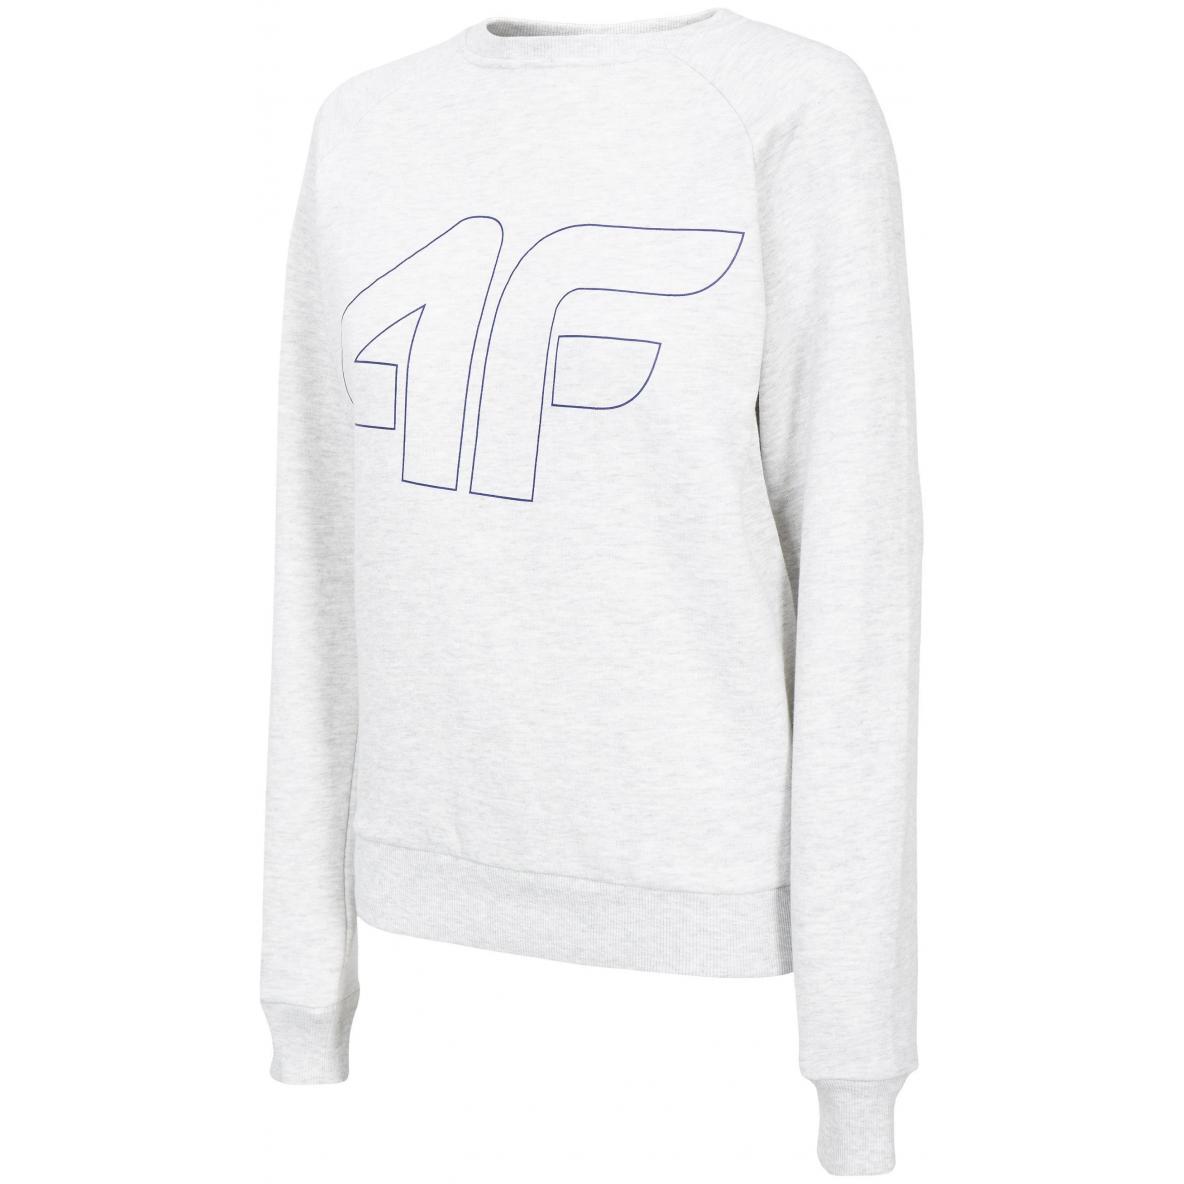 Damski bluza 4F szara